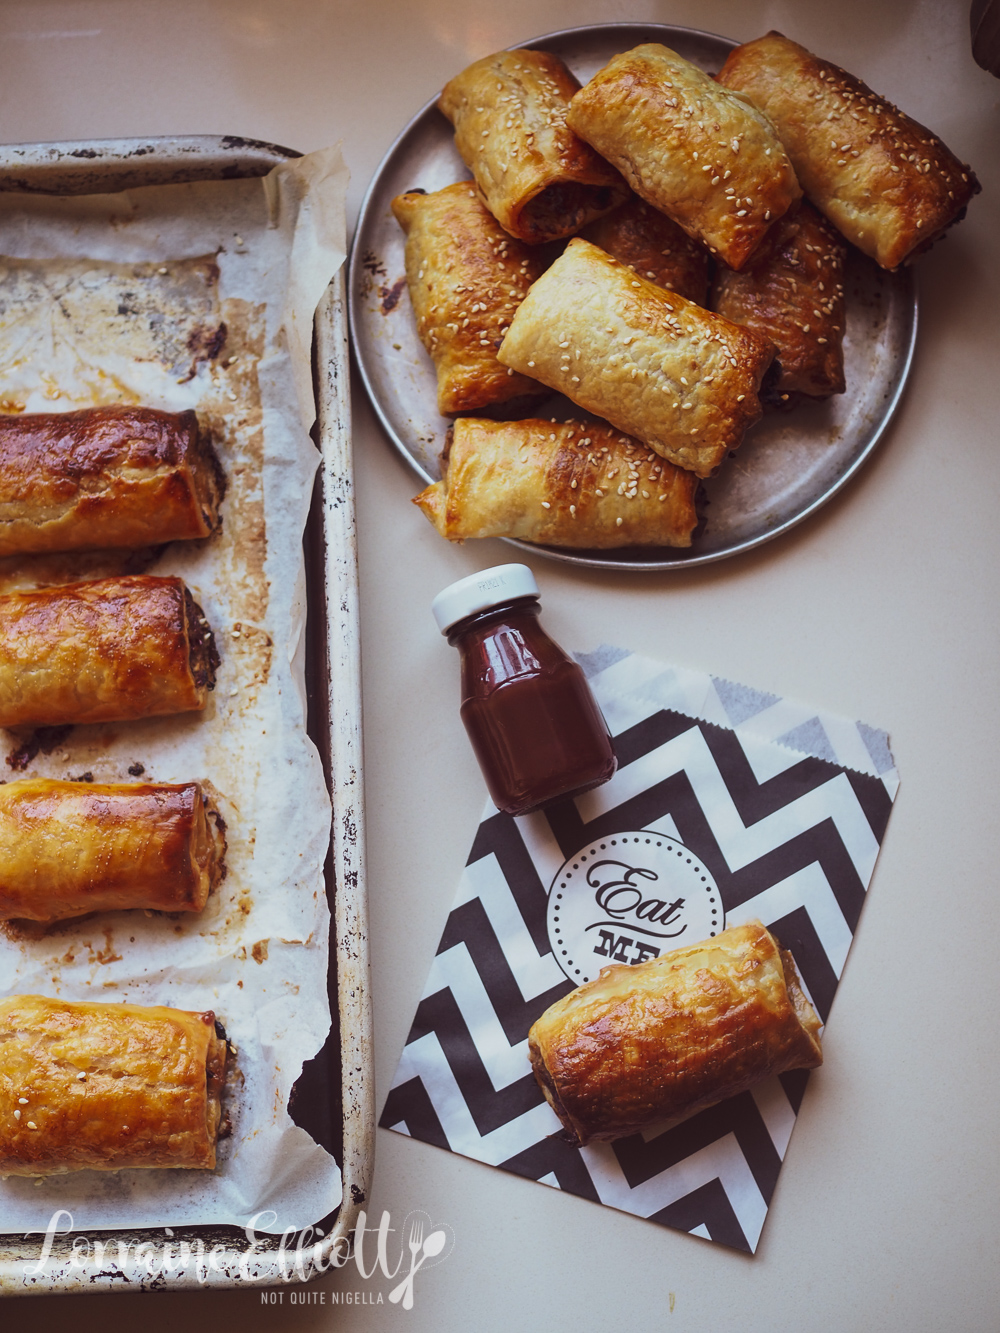 Top 5 Savoury Picnic Recipes